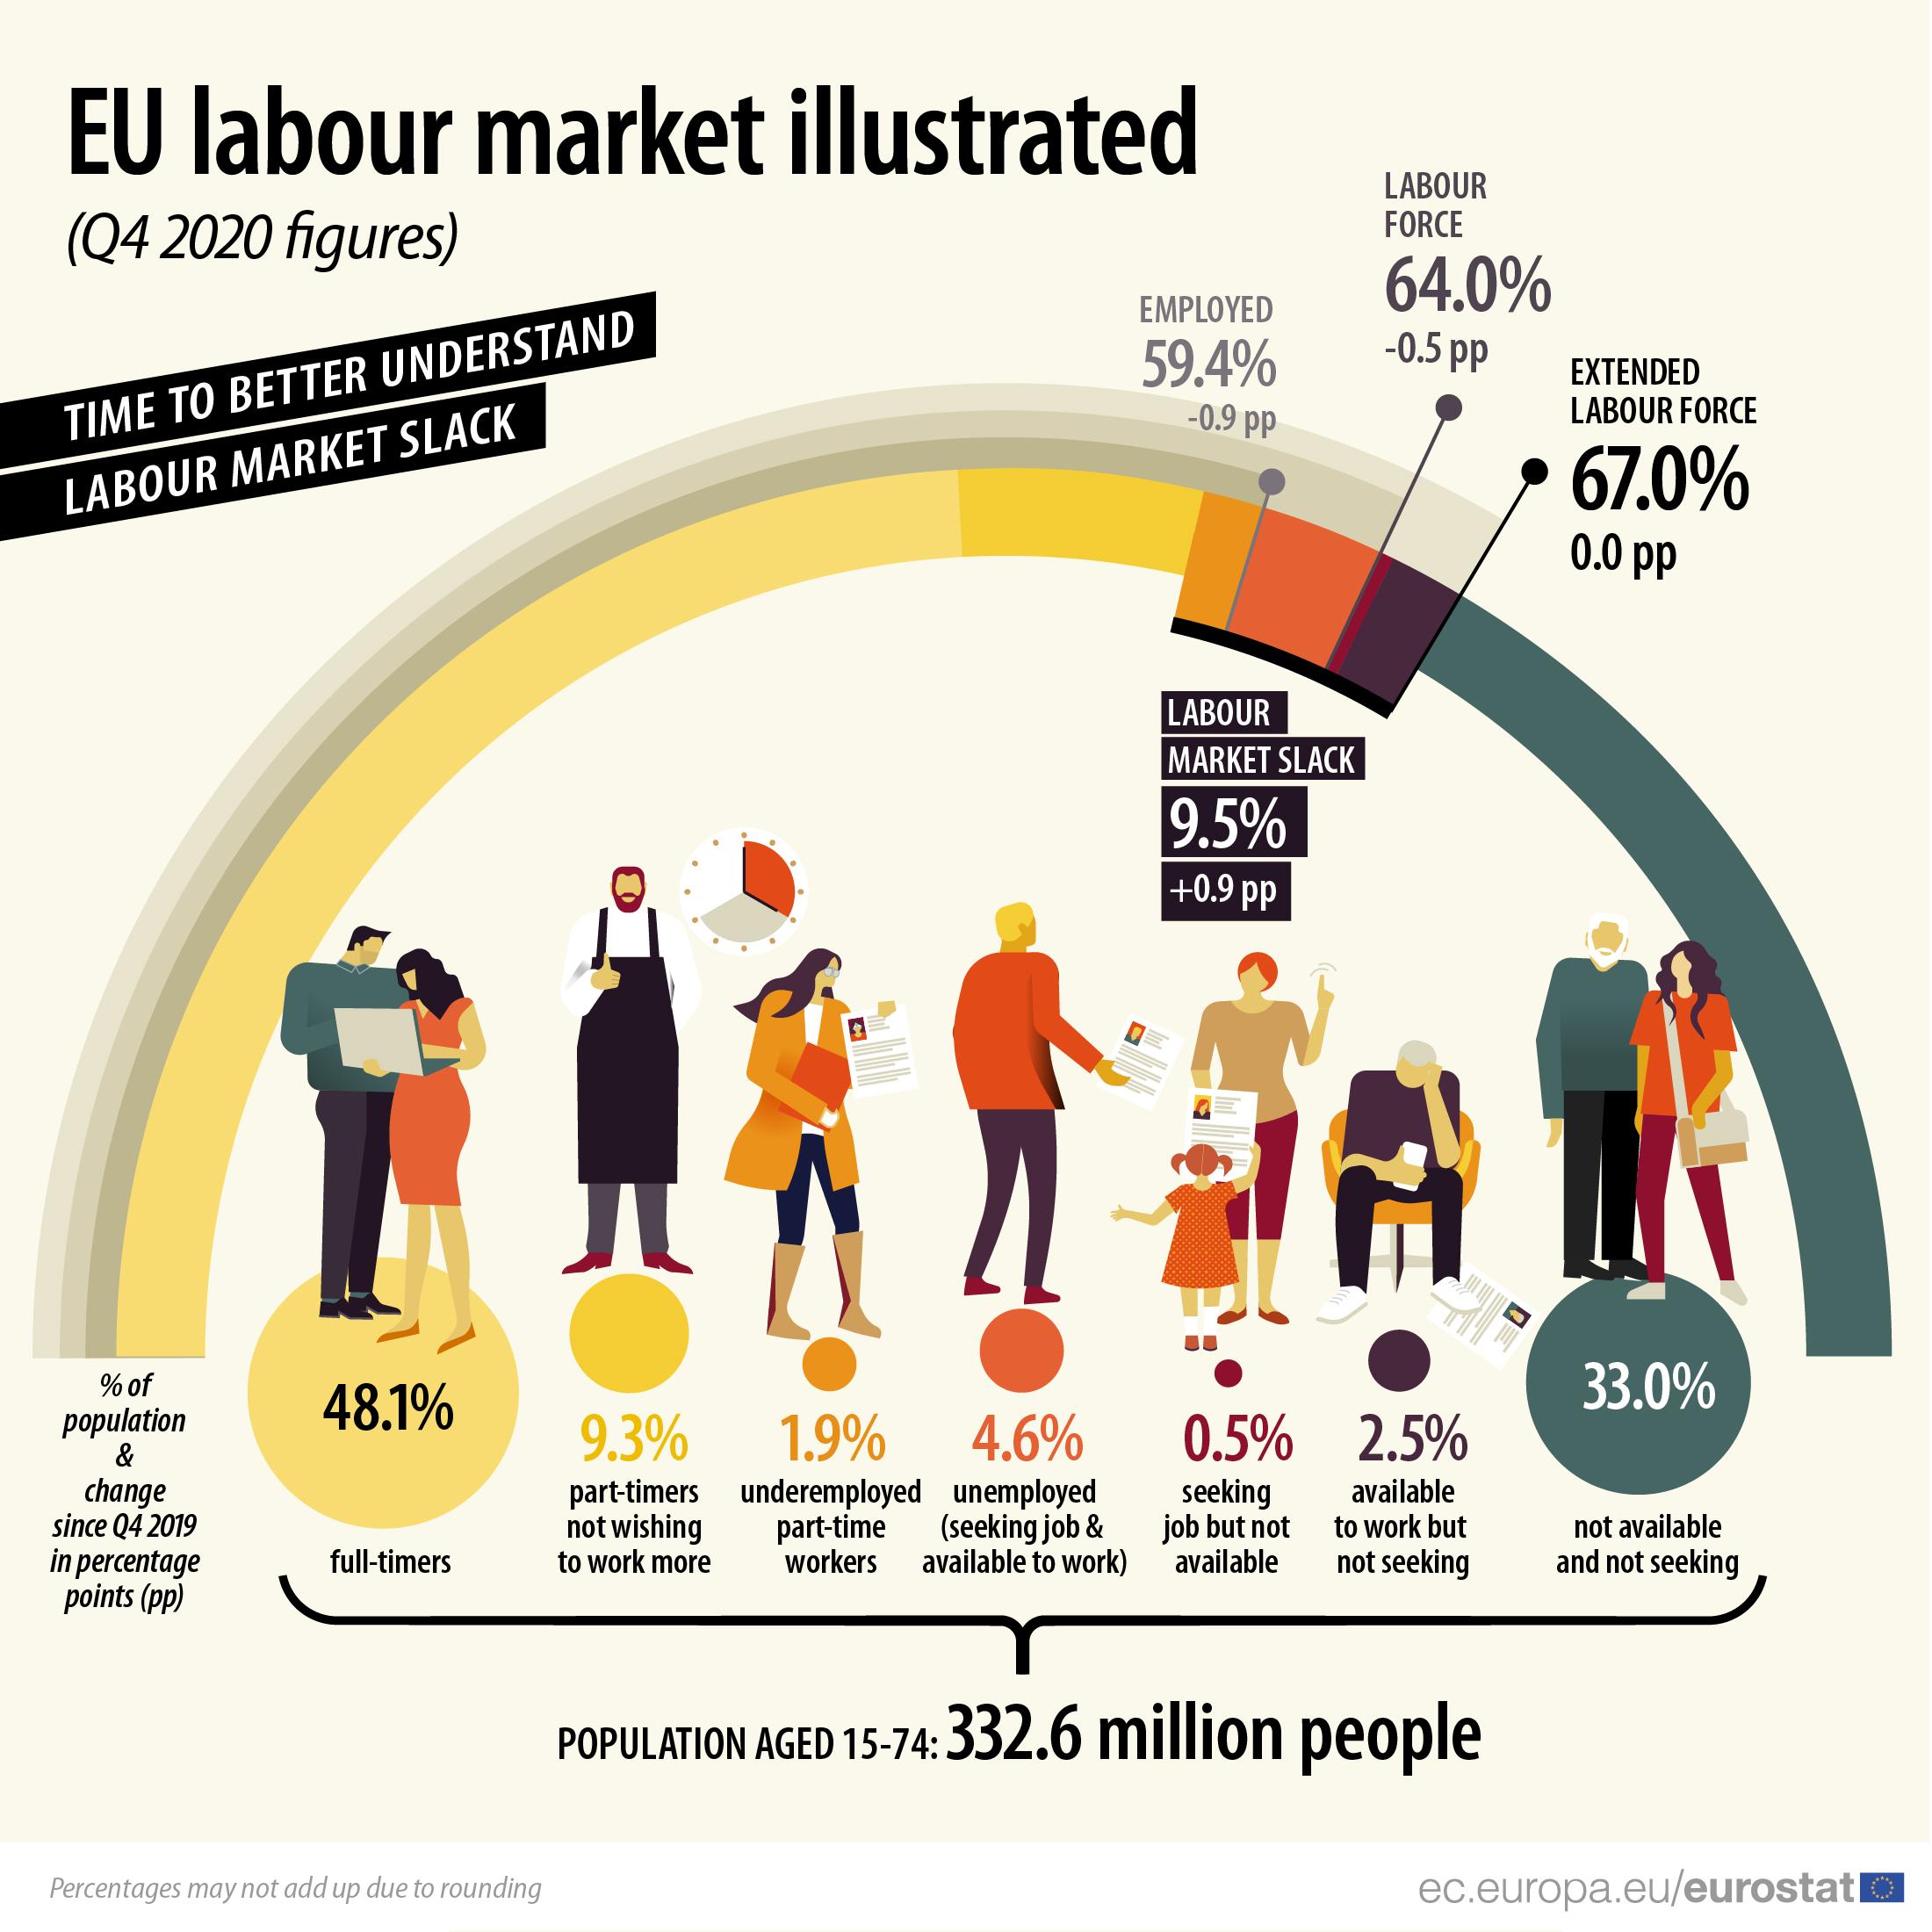 EU labour market illustrated, Q4 2020